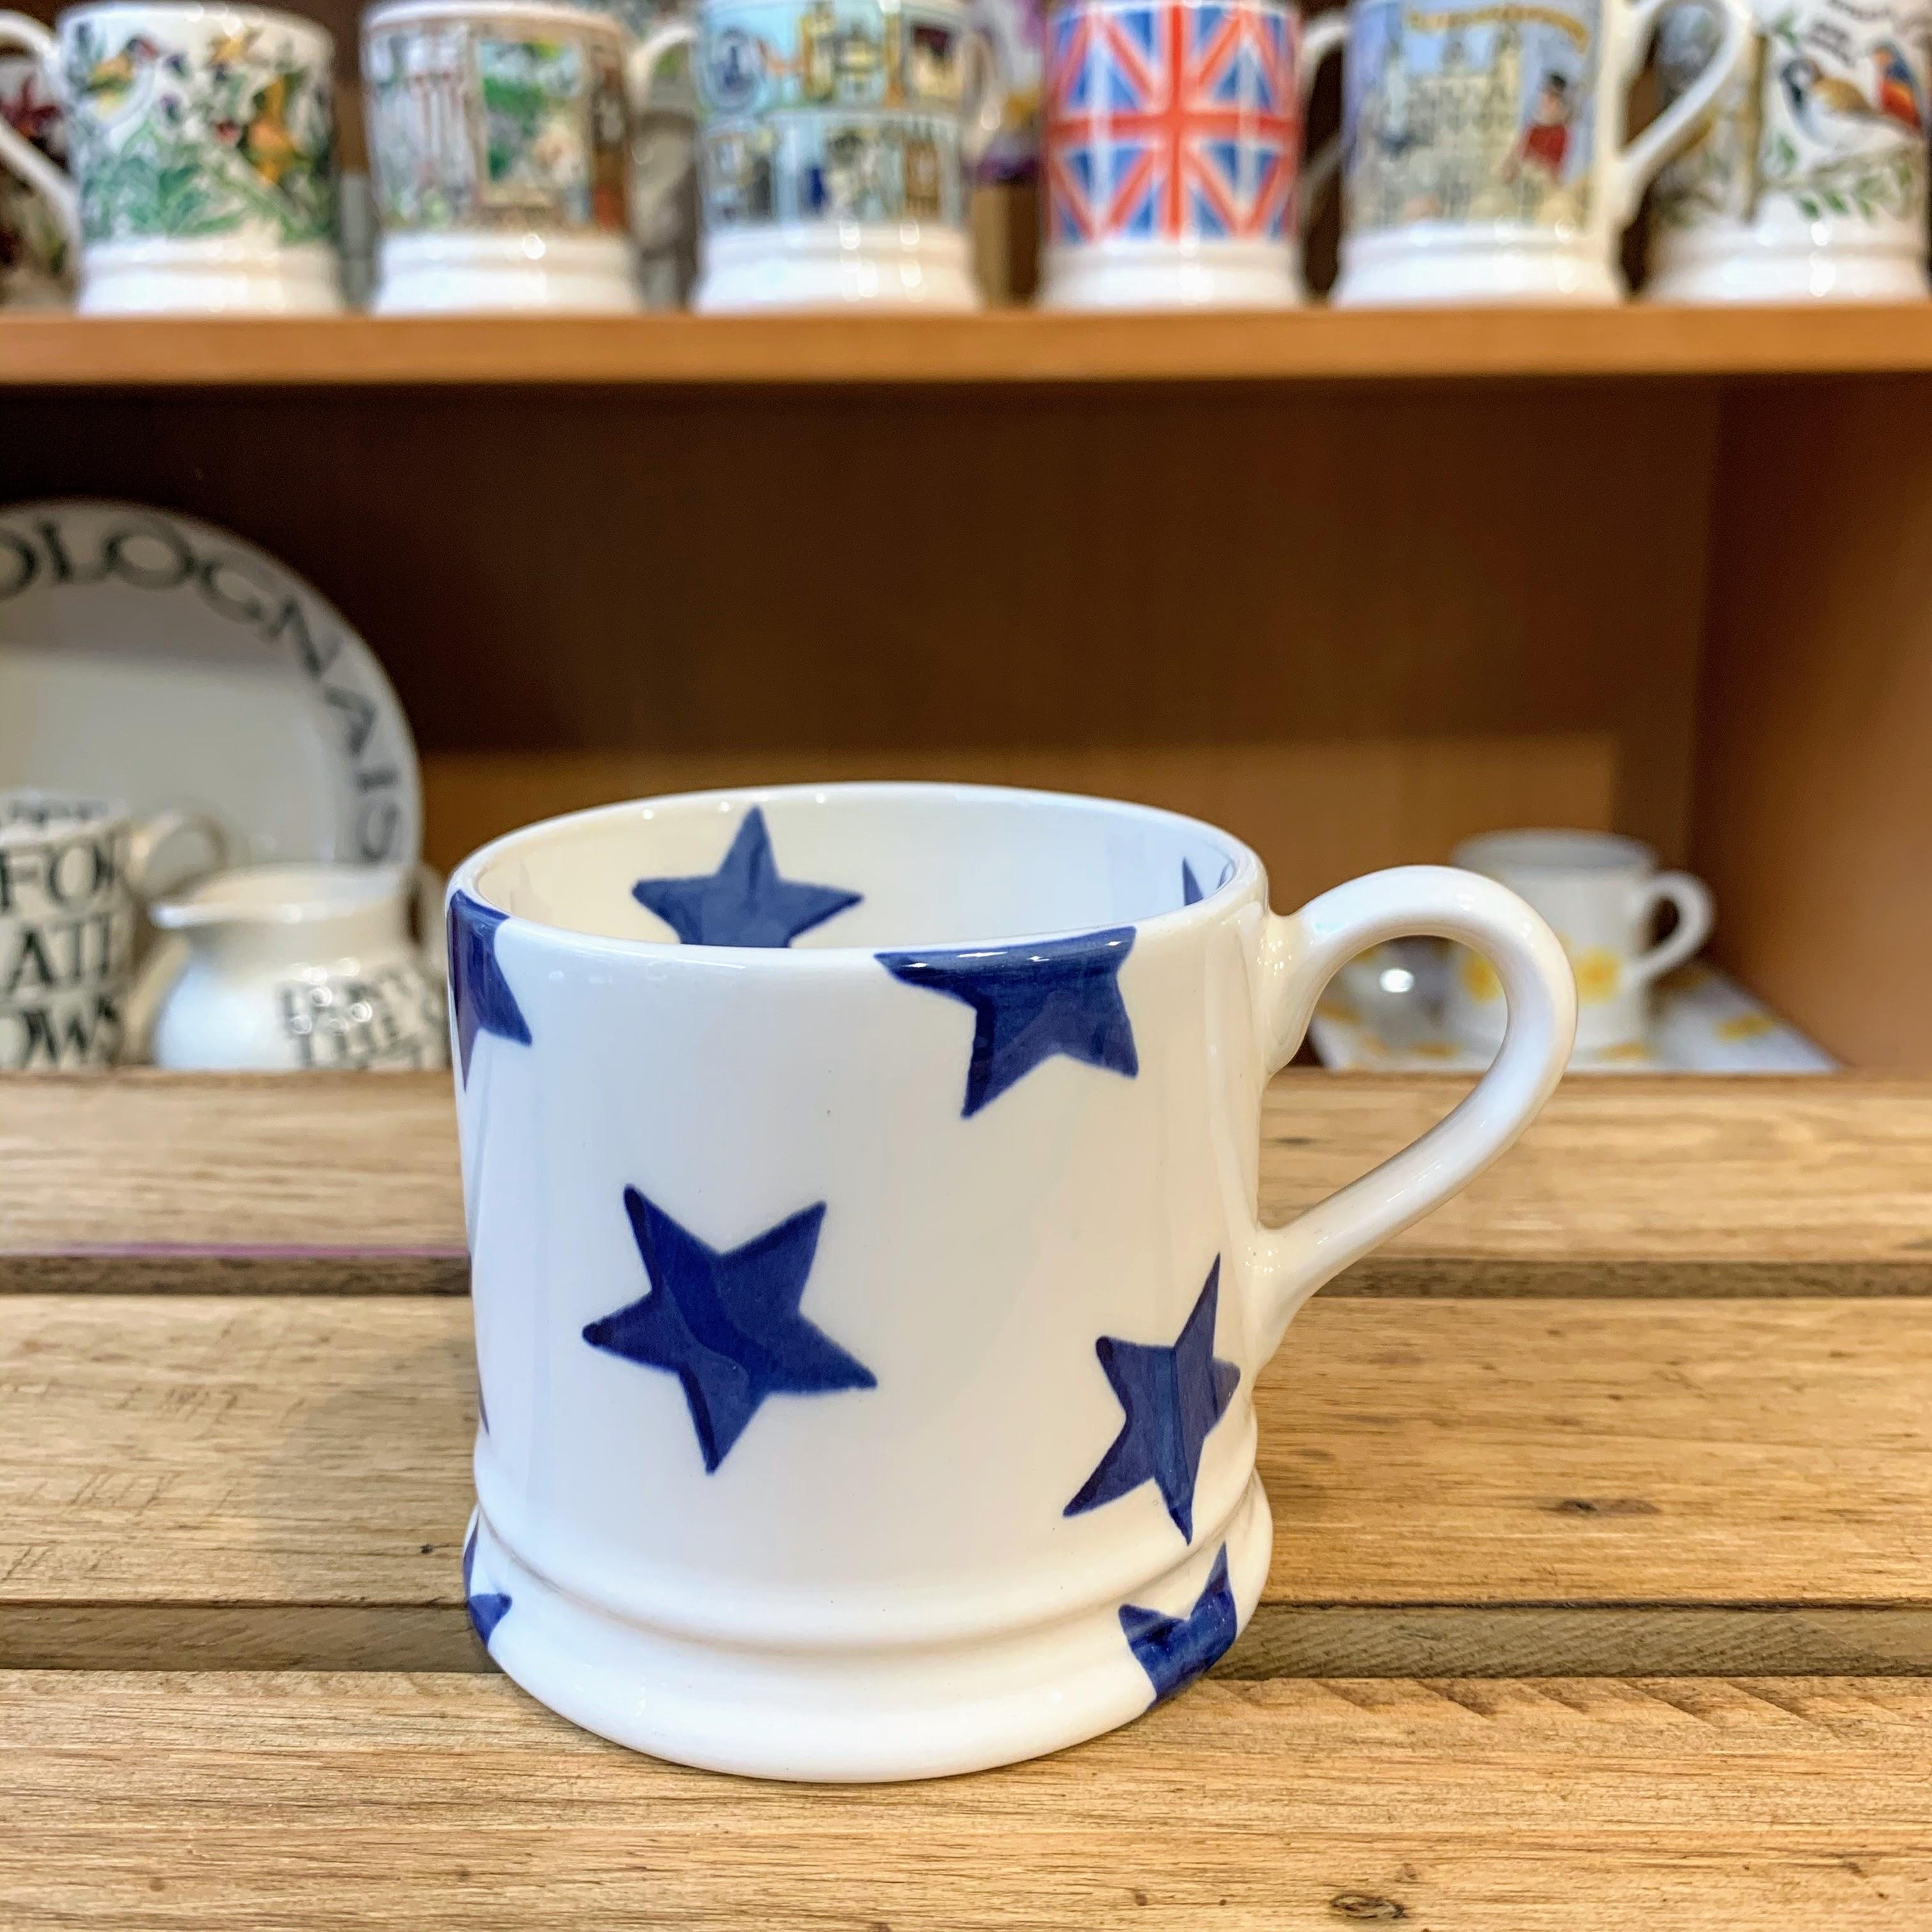 Emma Bridgewater Small Blue Star Mug